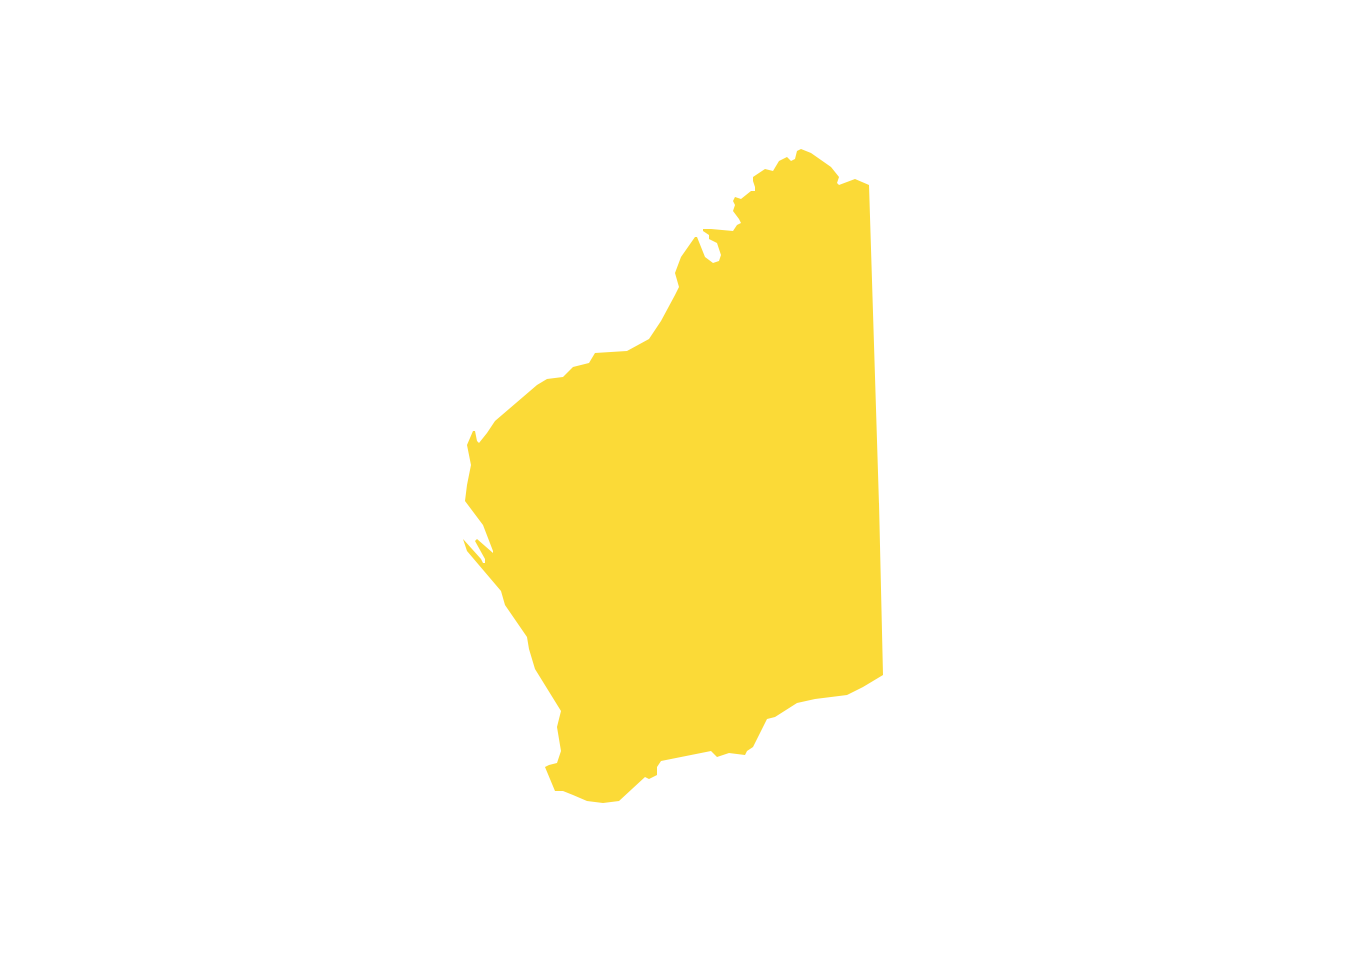 Western australia clipart.